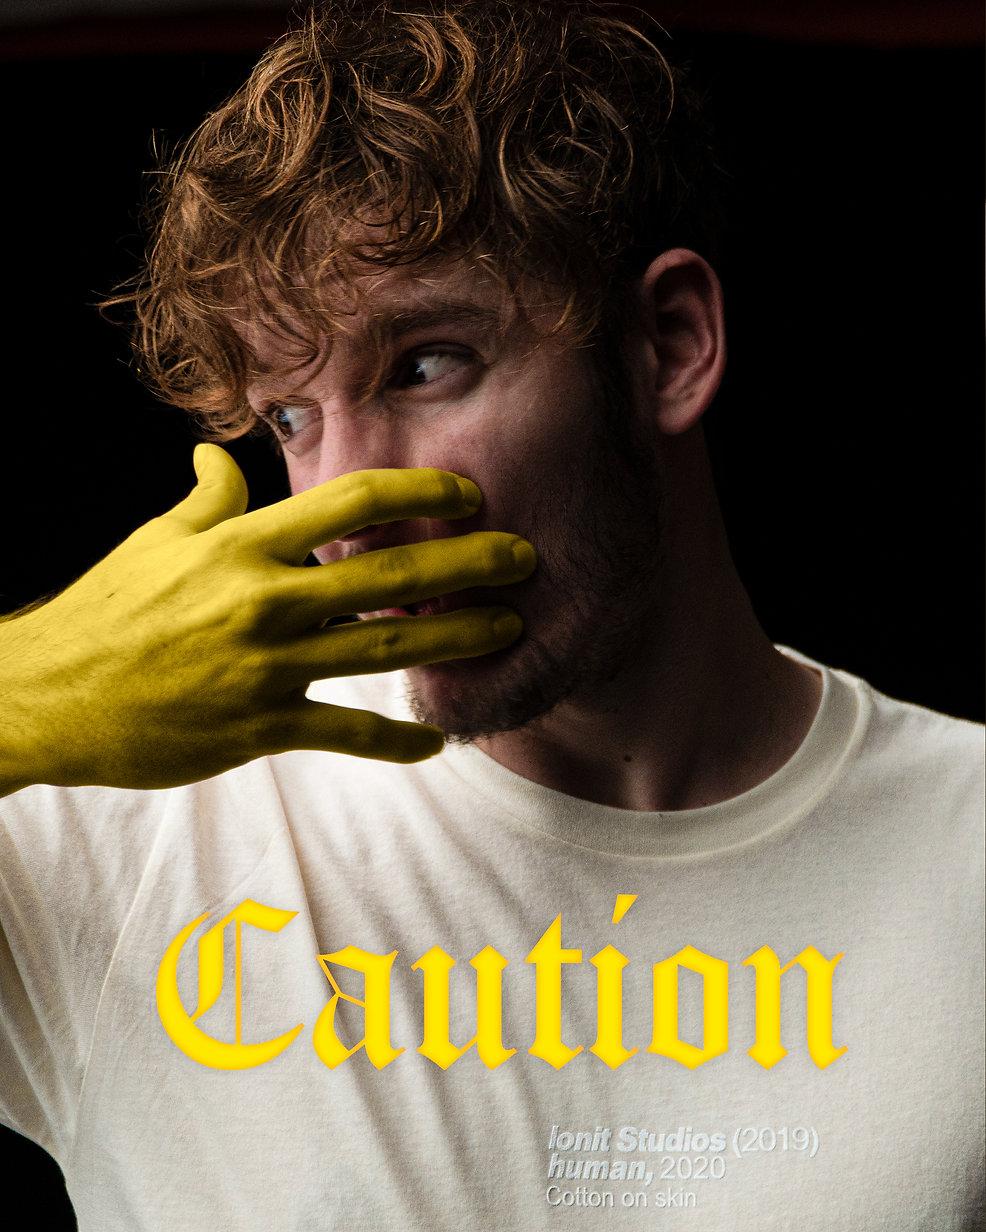 2020-4-4-Caution_01.jpg